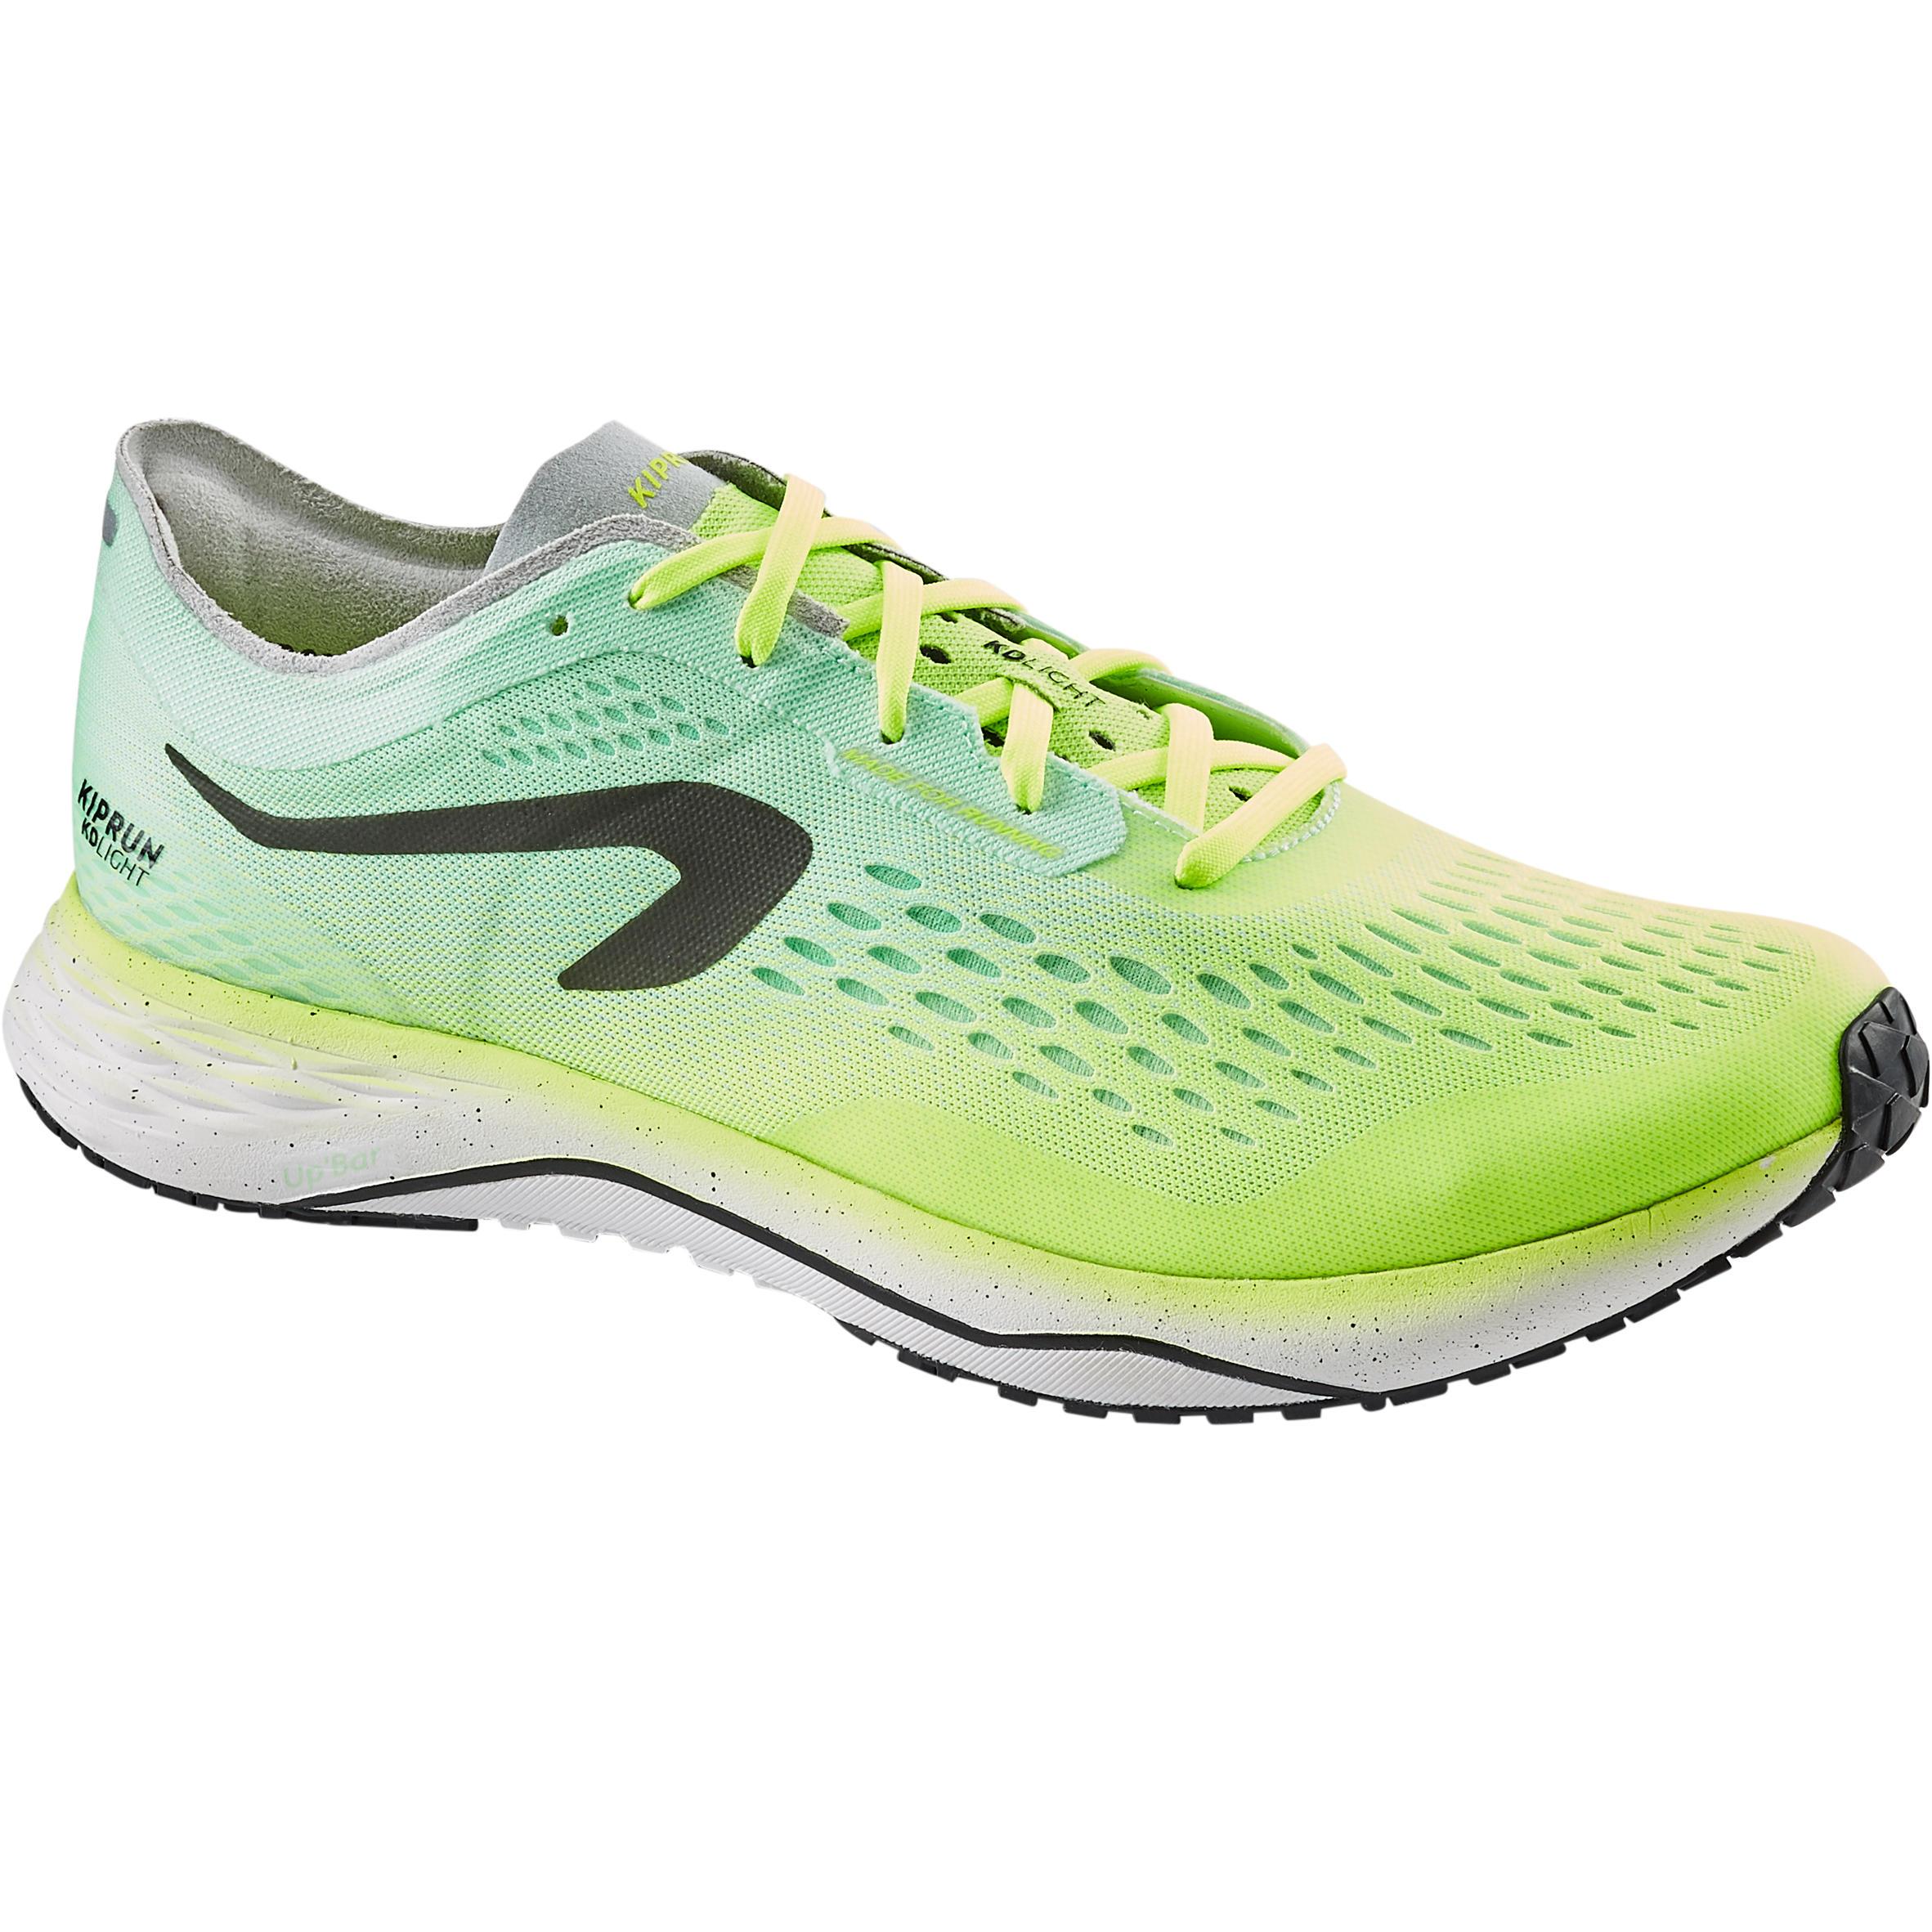 Marathon \u0026 Road Running Shoes Buy Online